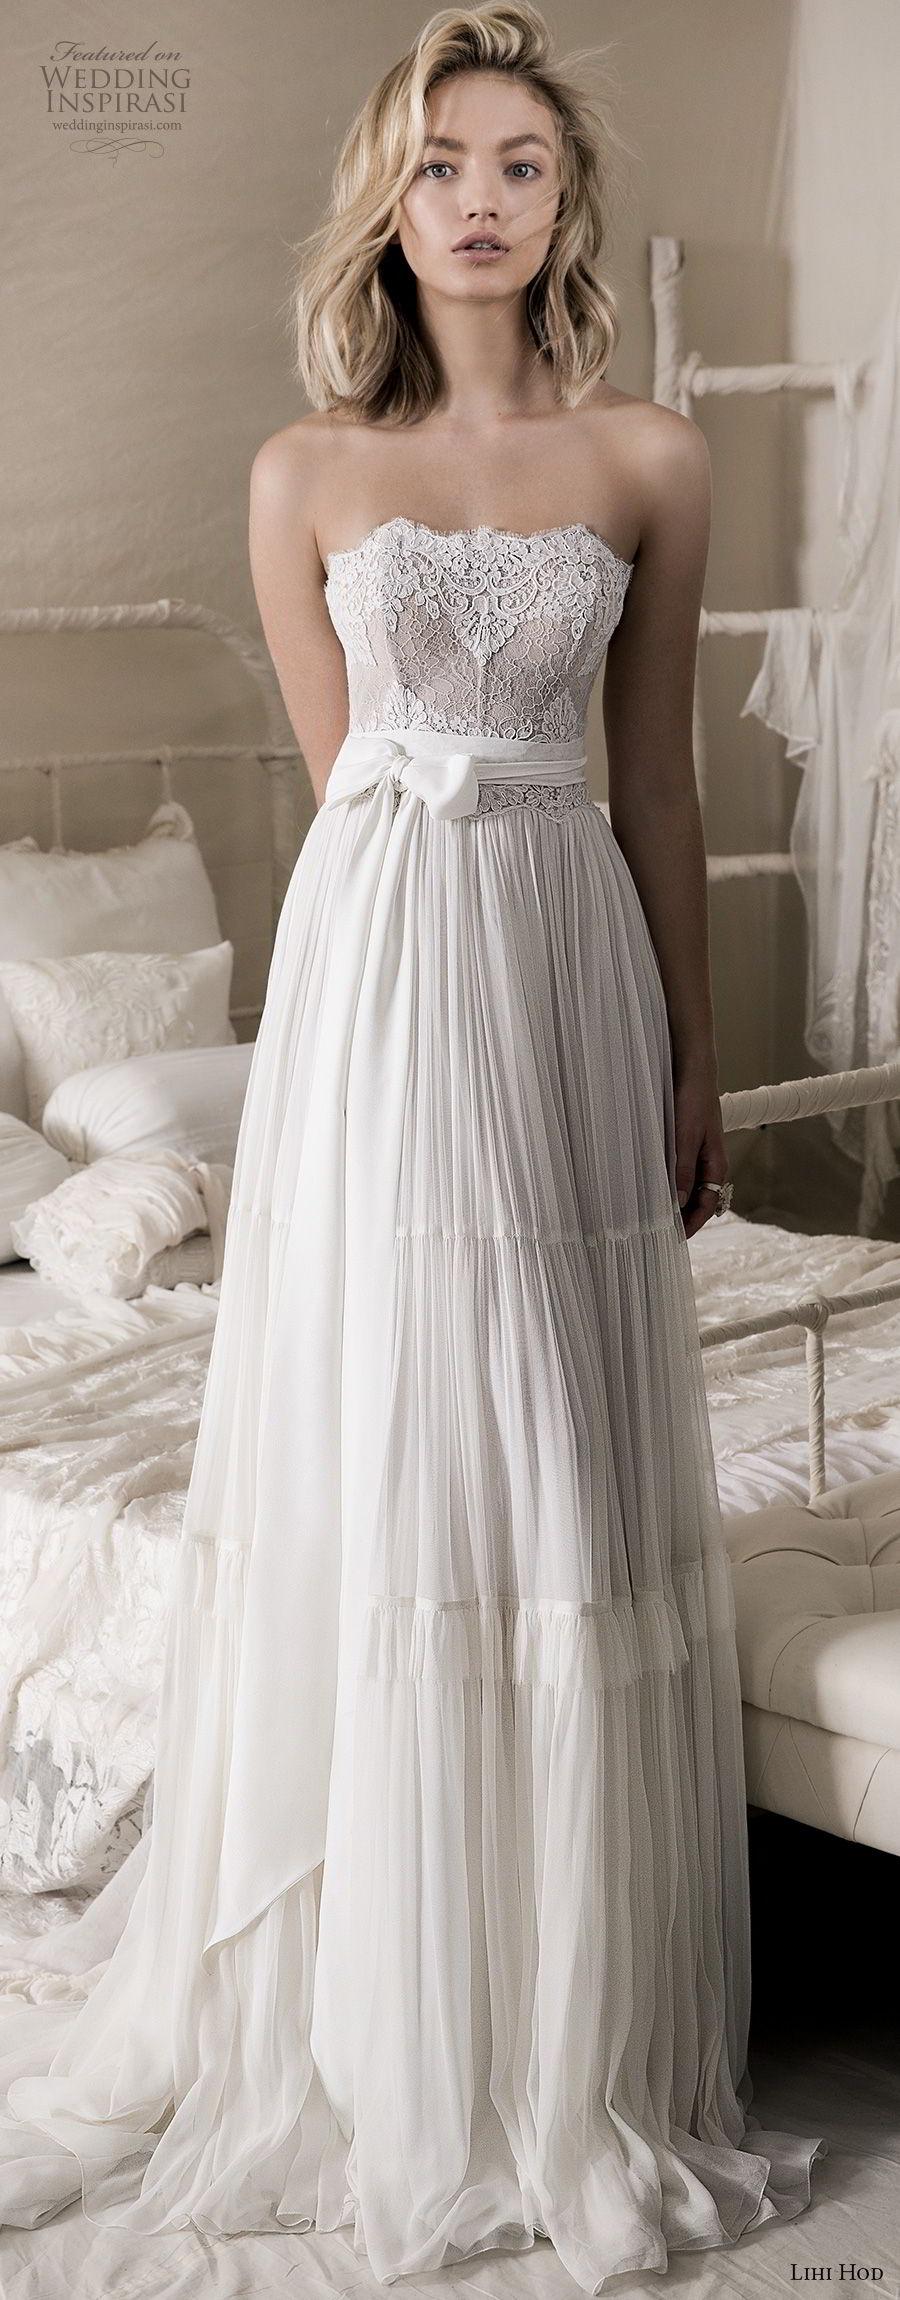 lihi hod 2018 bridal strapless straight across neckline heavily embellished bodice romantic bohemian soft a line wedding dress medium train (3) lv fv